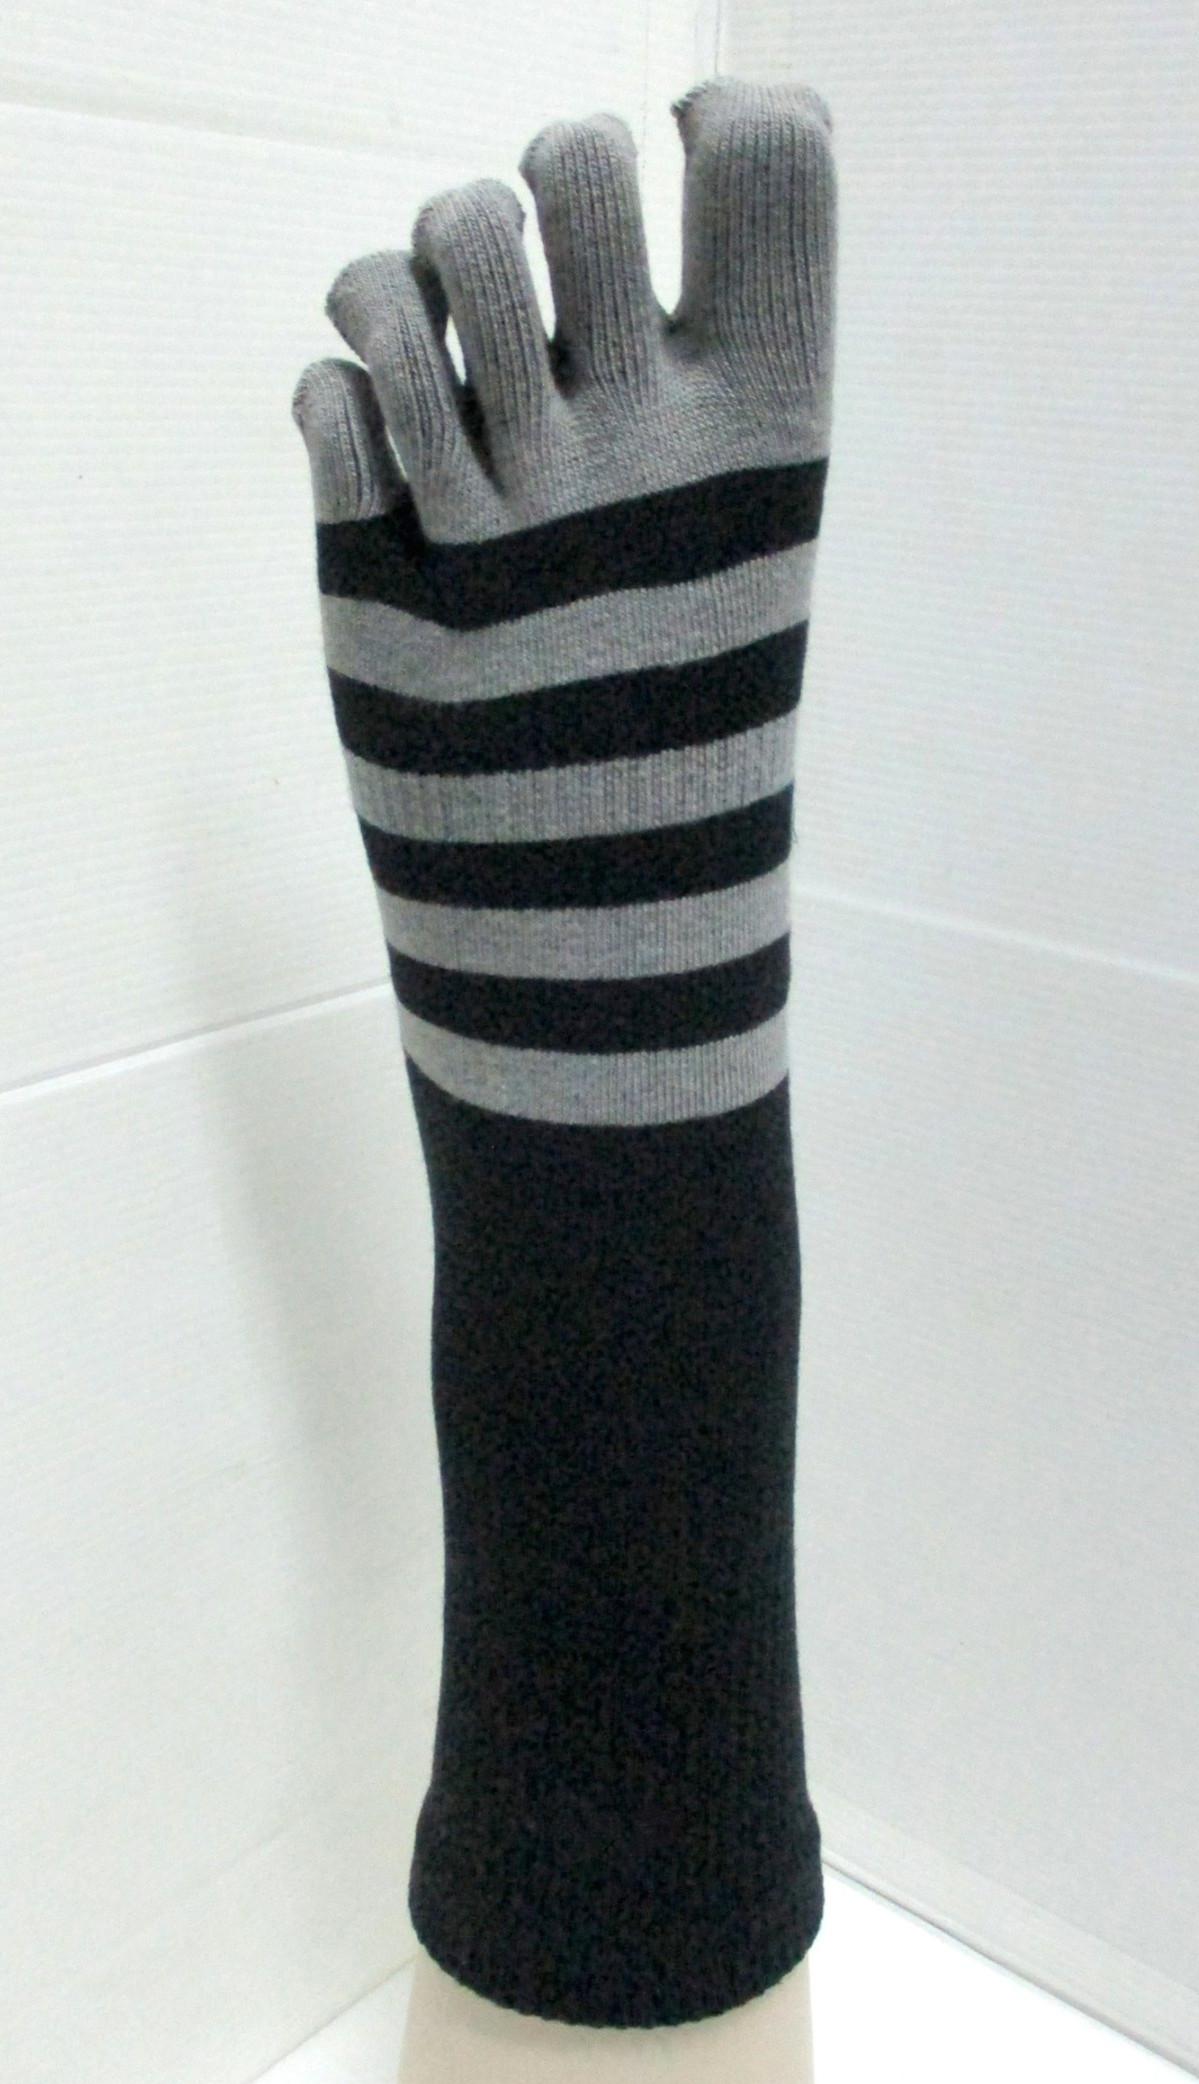 Crew 5 toe simply striped sock